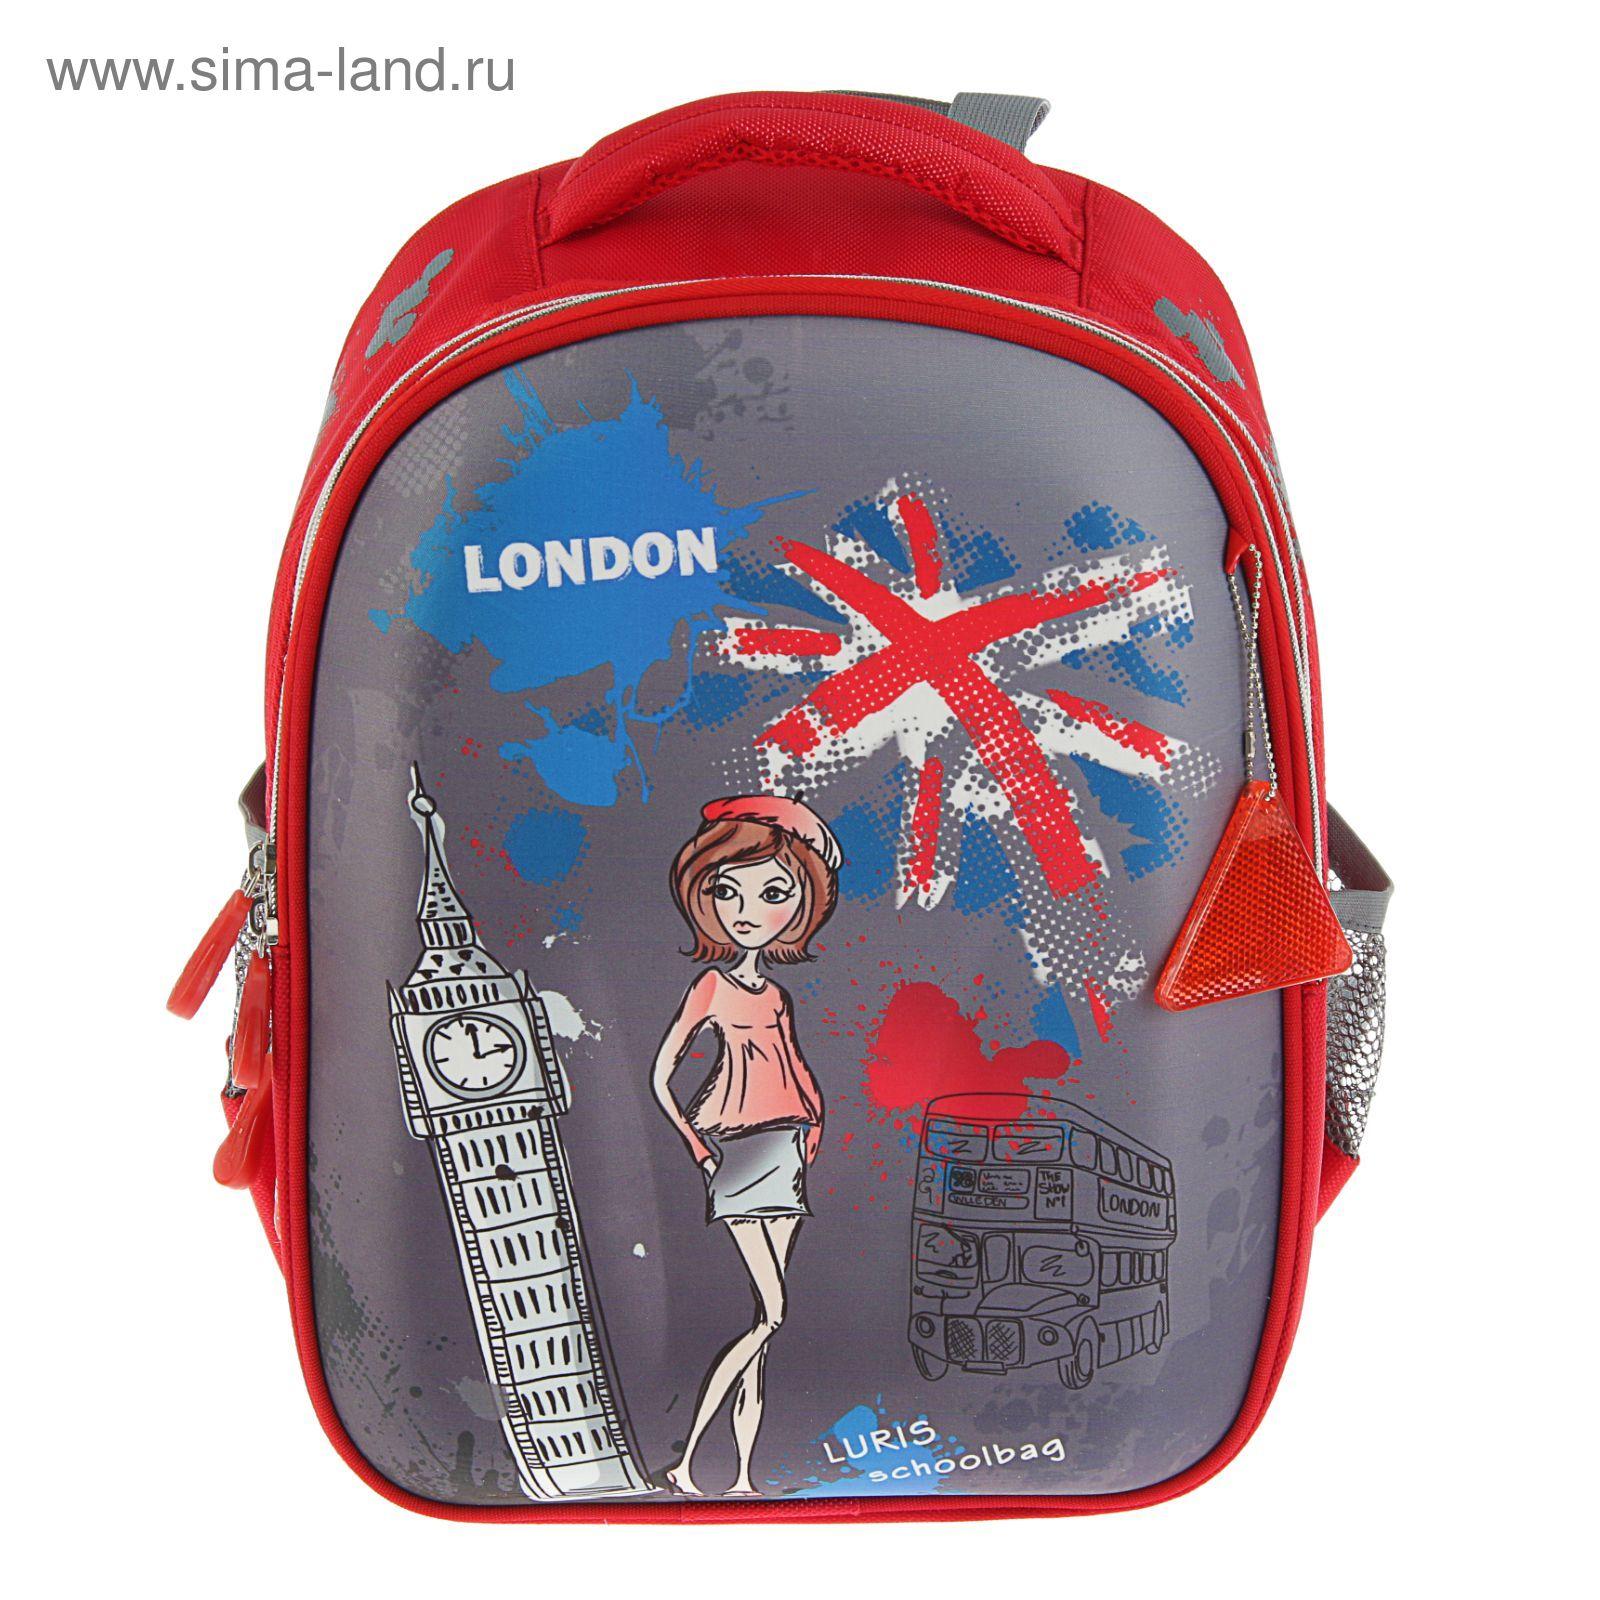 bfd541e4de99 Рюкзак каркасный Luris 38*28*18 Джерри 1 + мешок для обуви для девочки